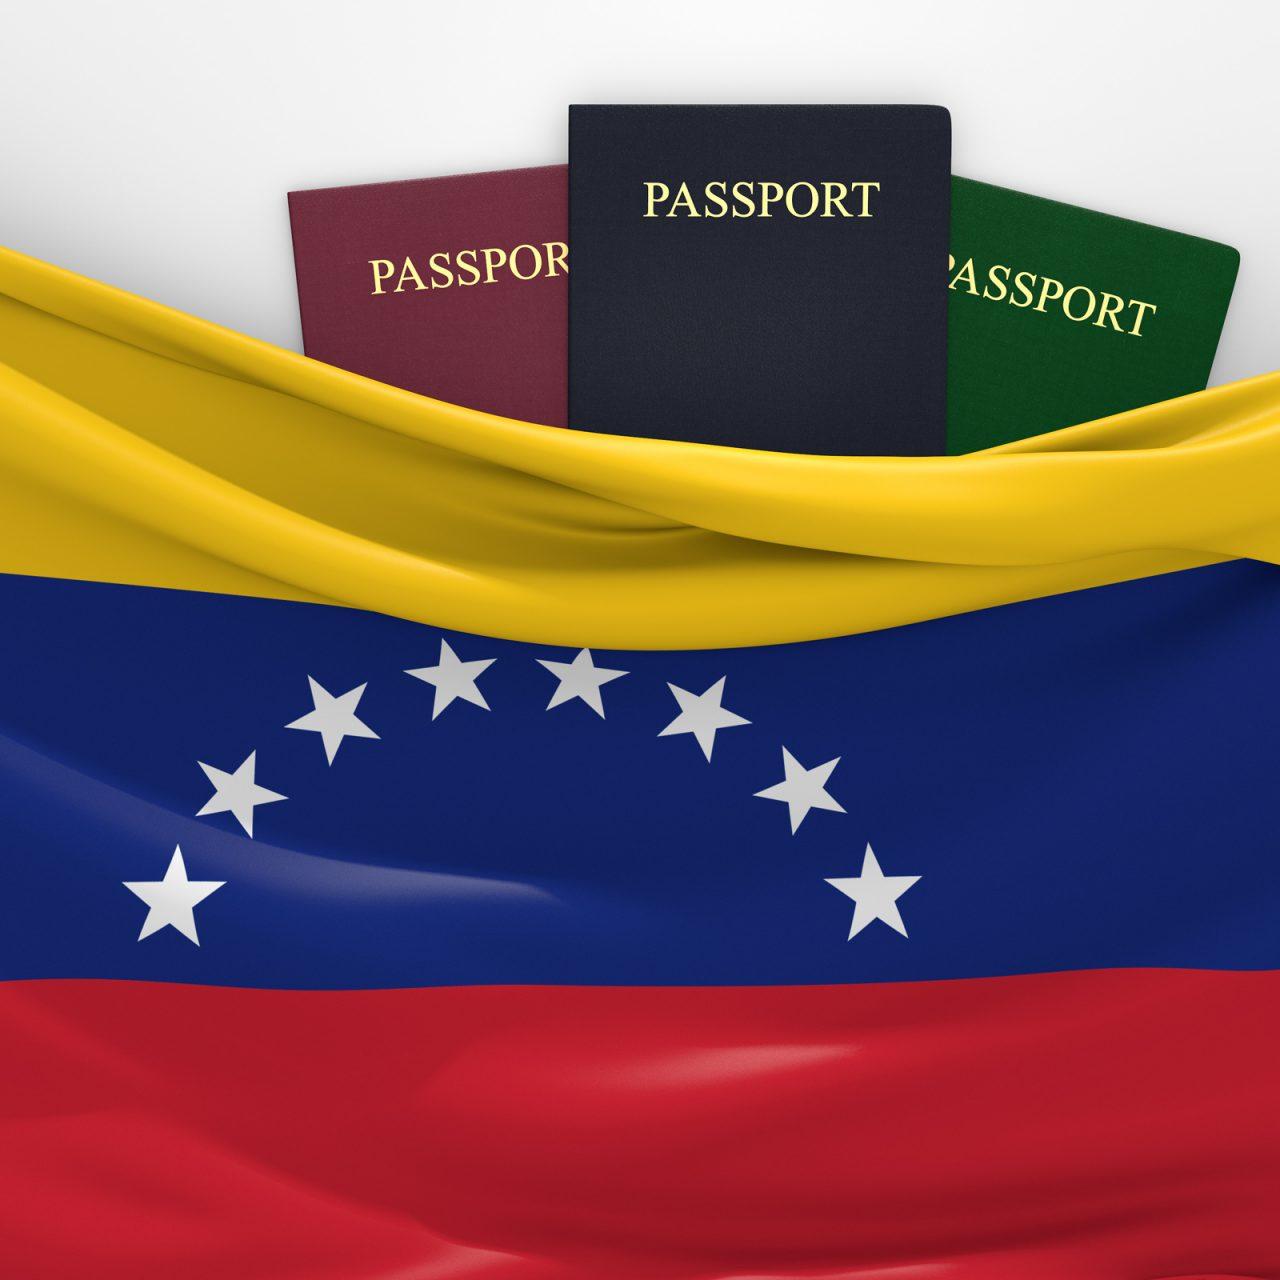 https://benevolentia.llc/wp-content/uploads/2021/04/venezuela-1280x1280.jpg